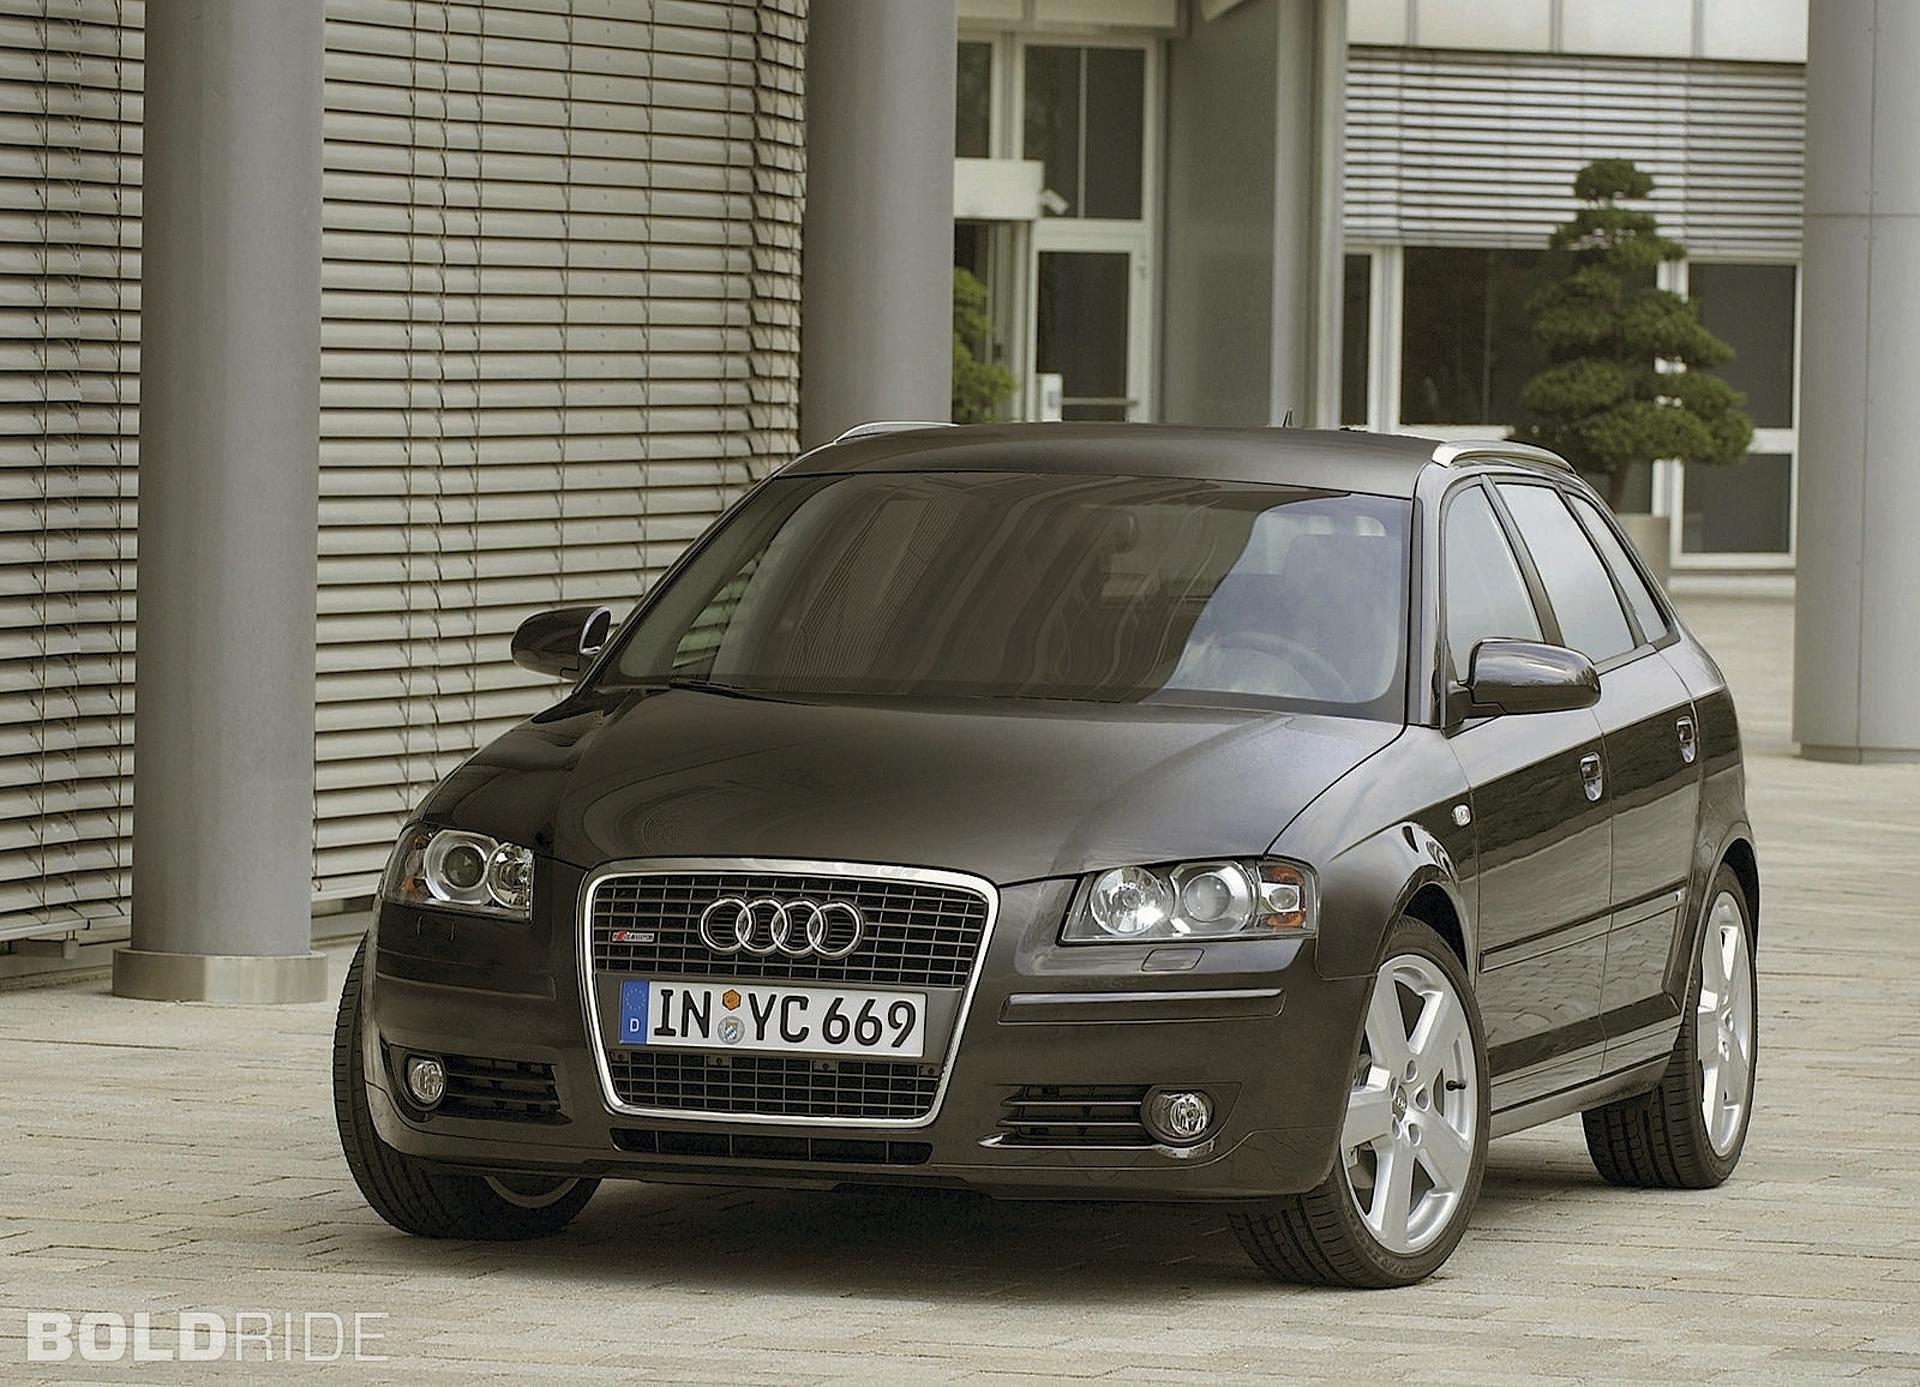 Audi A3 Sportback Sline Product 20101208 23:27:15